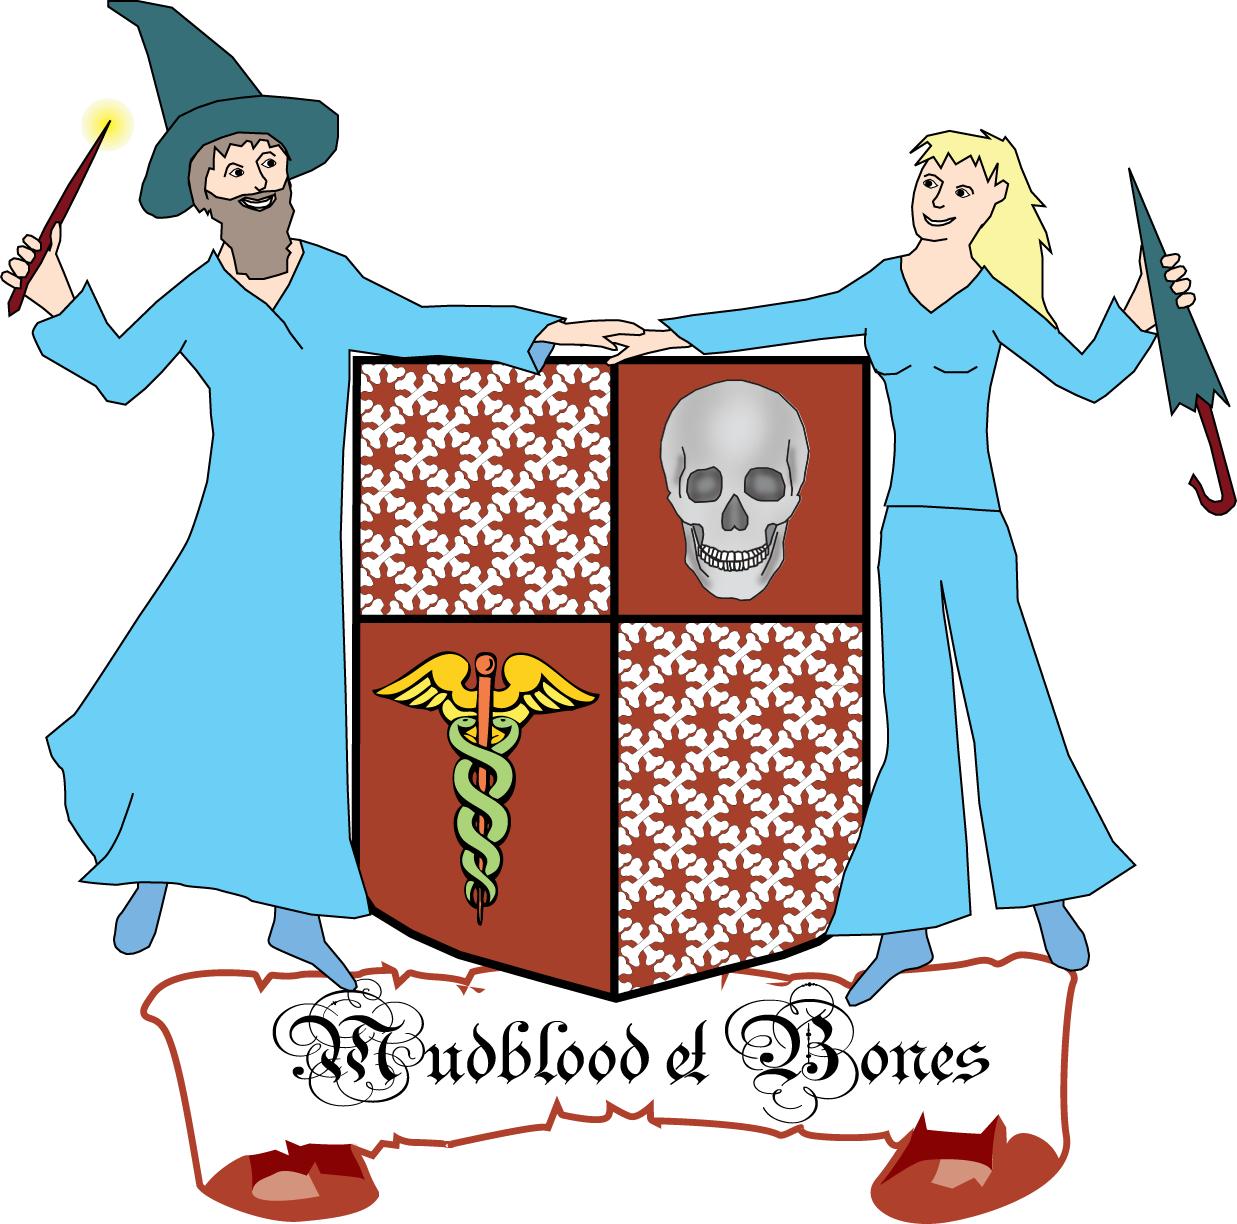 http://www.bloodandbones.com/thegame/Hogwarts.png